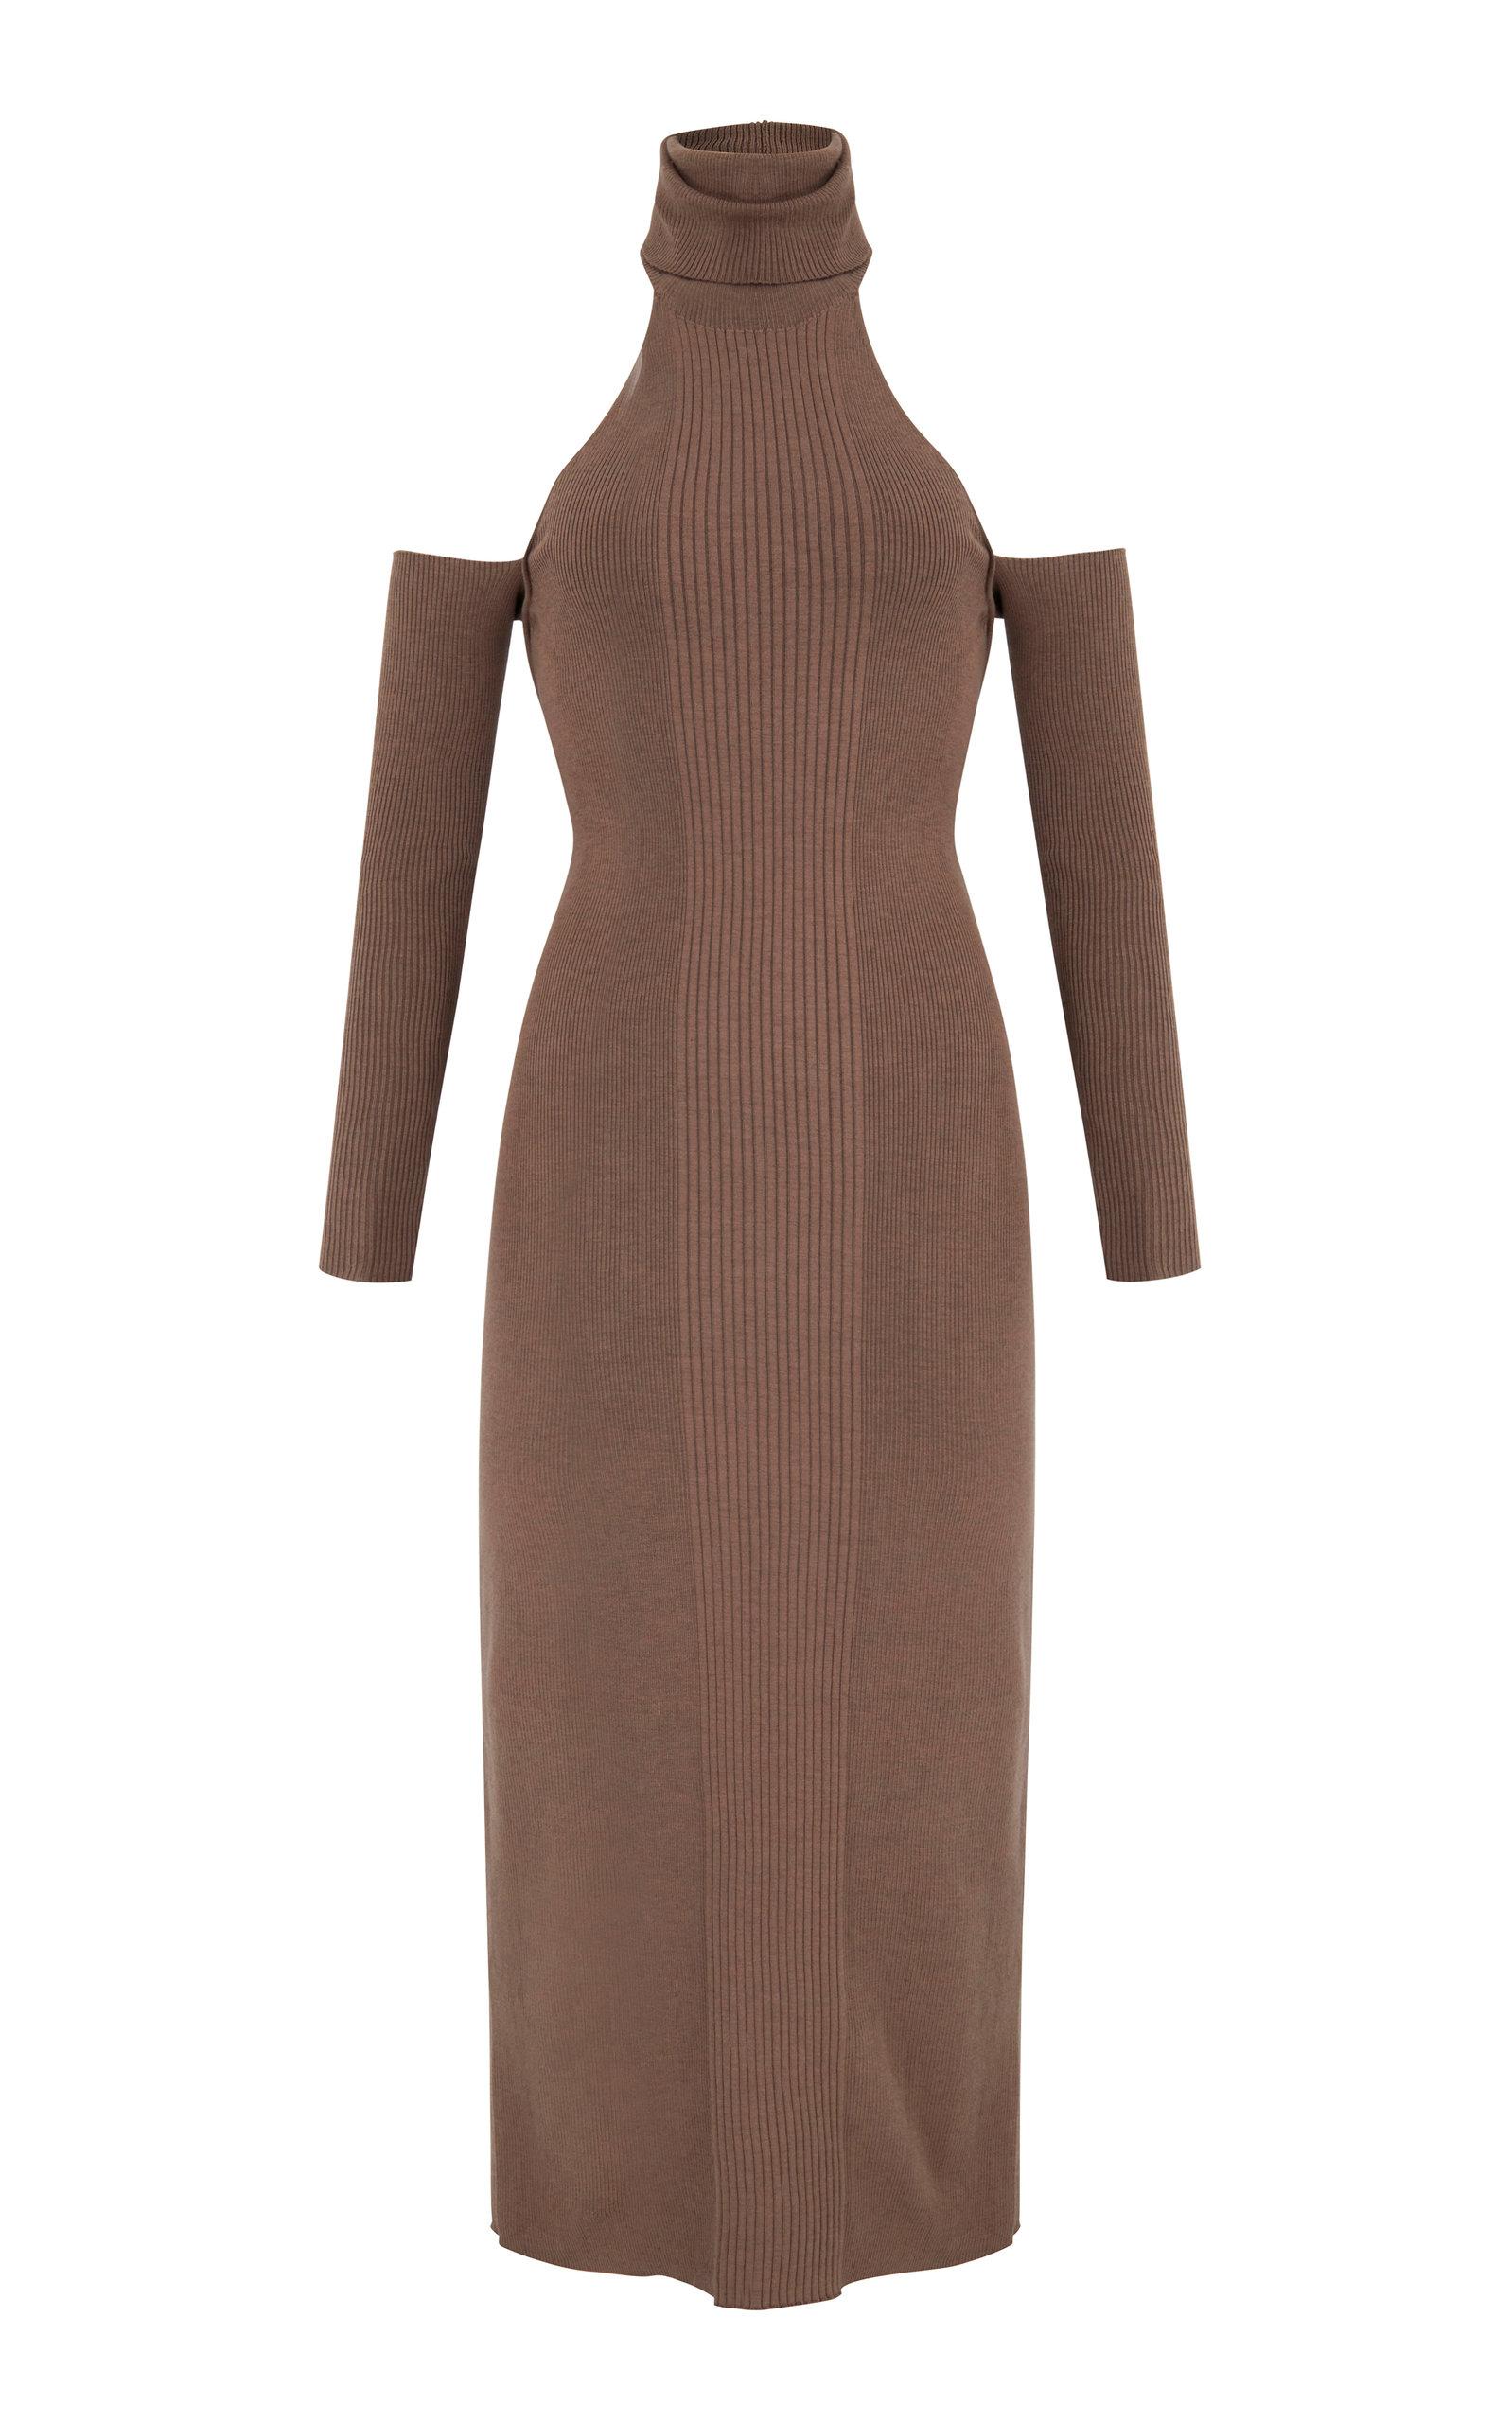 Women's Loma Cold-Shoulder Knit Midi Dress